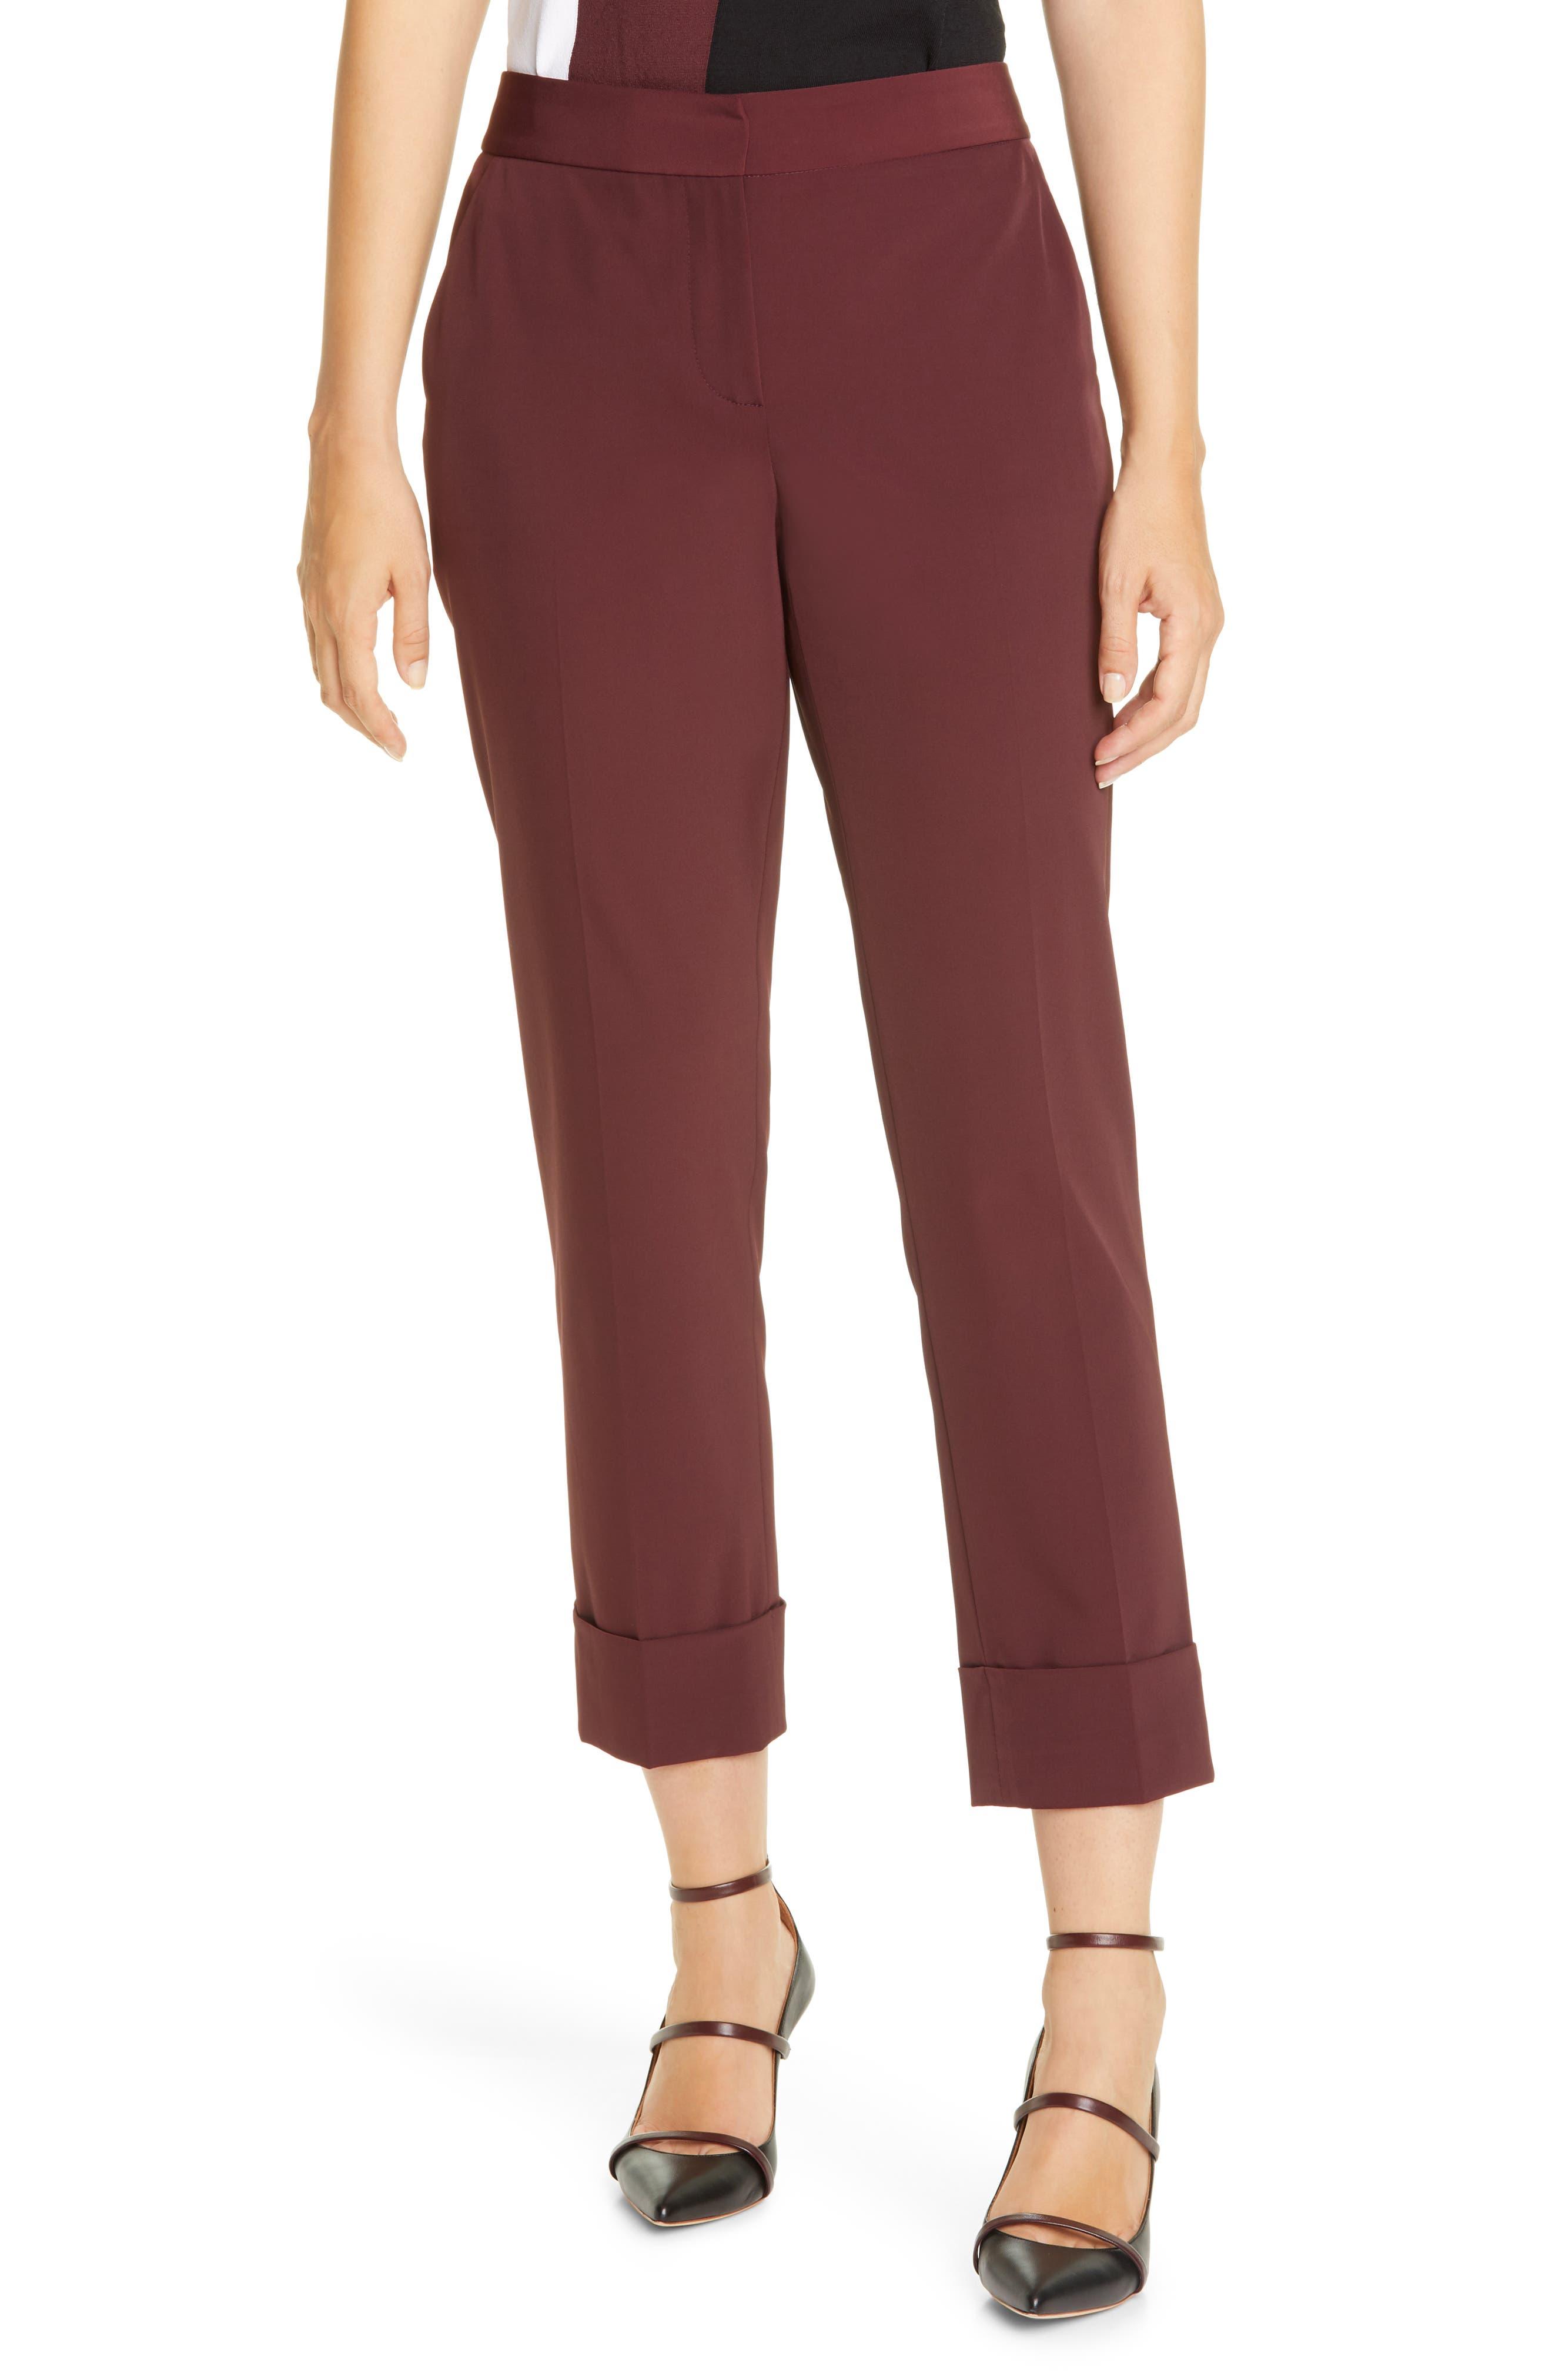 Reva Cuffed Crop Pants